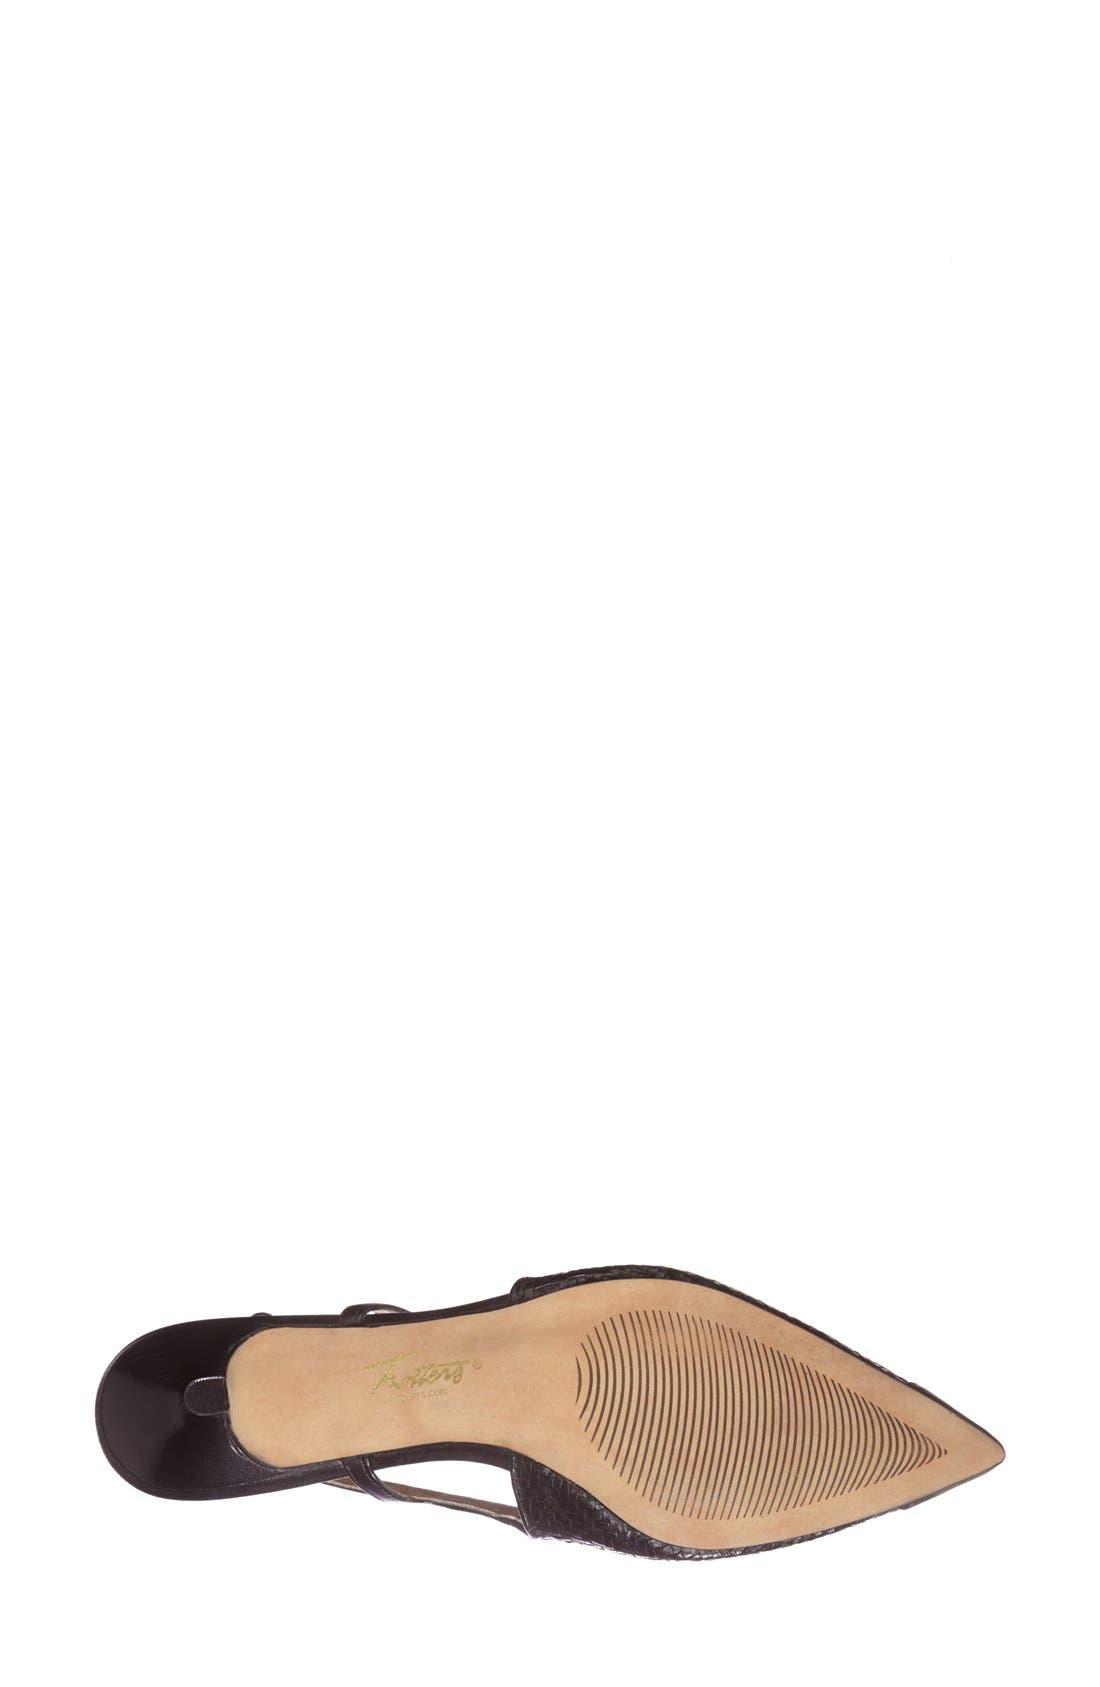 'Kimberly' Woven Leather Slingback Pump,                             Alternate thumbnail 4, color,                             BLACK